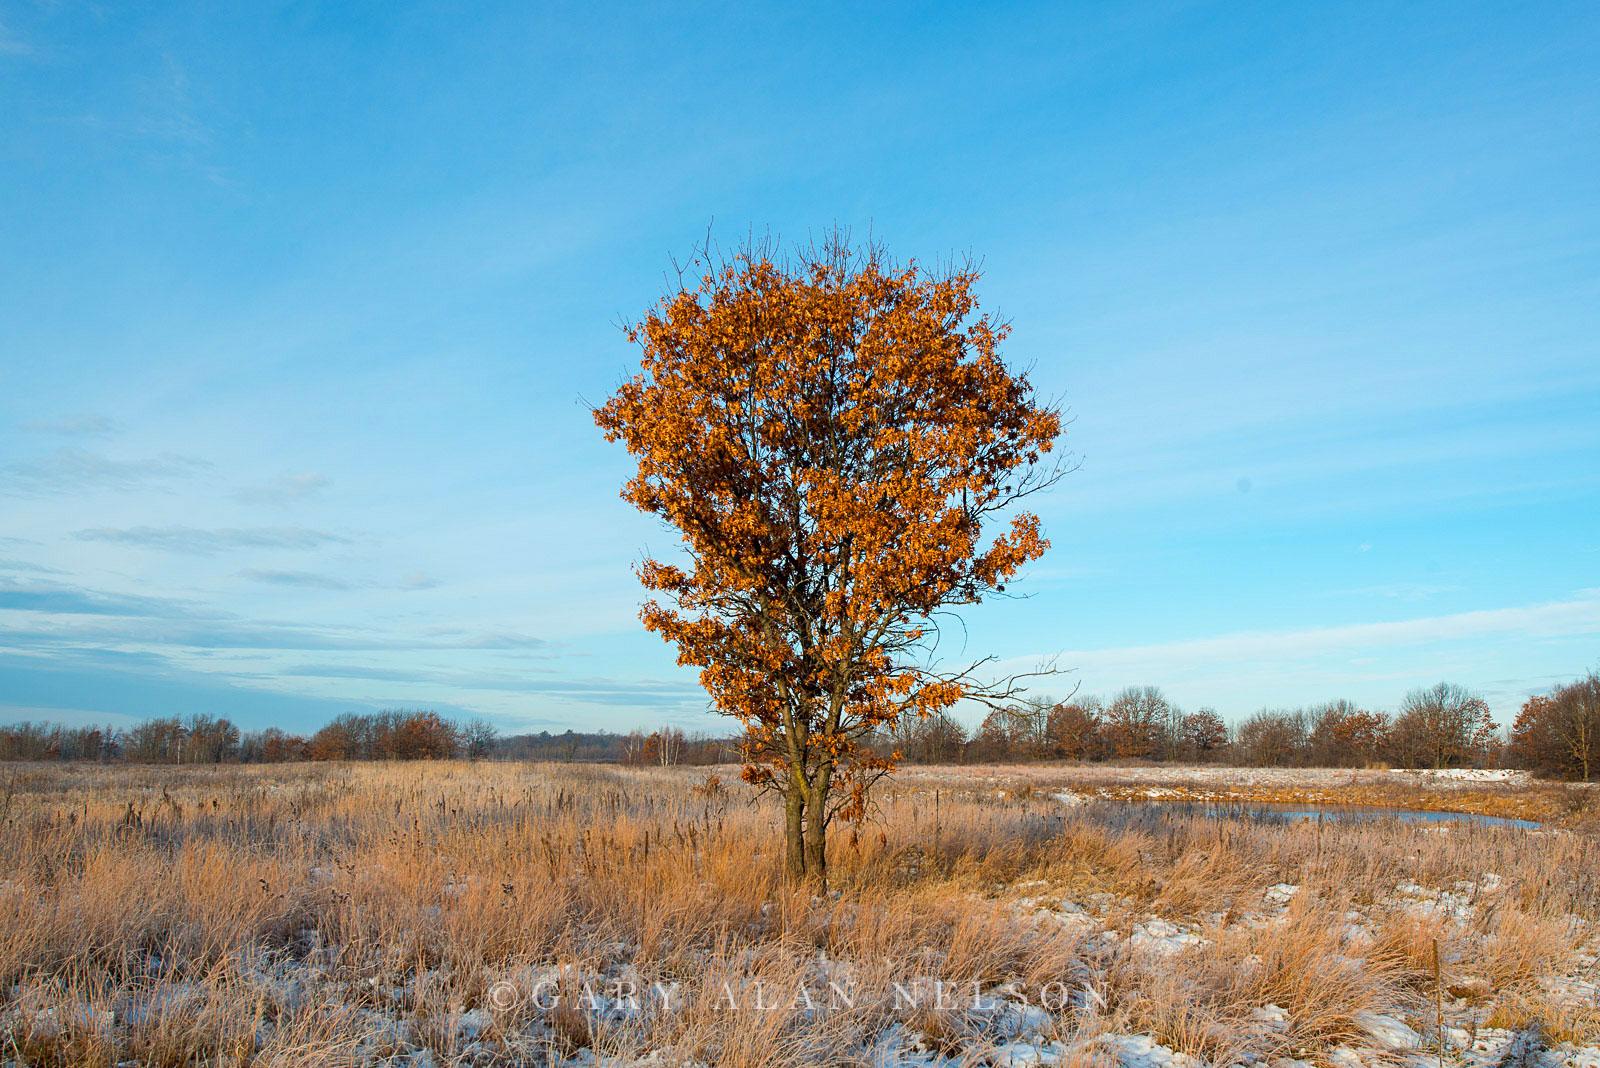 Oak tree on prairie, Carlos Avery State Wildlife Management Area, Minnesota